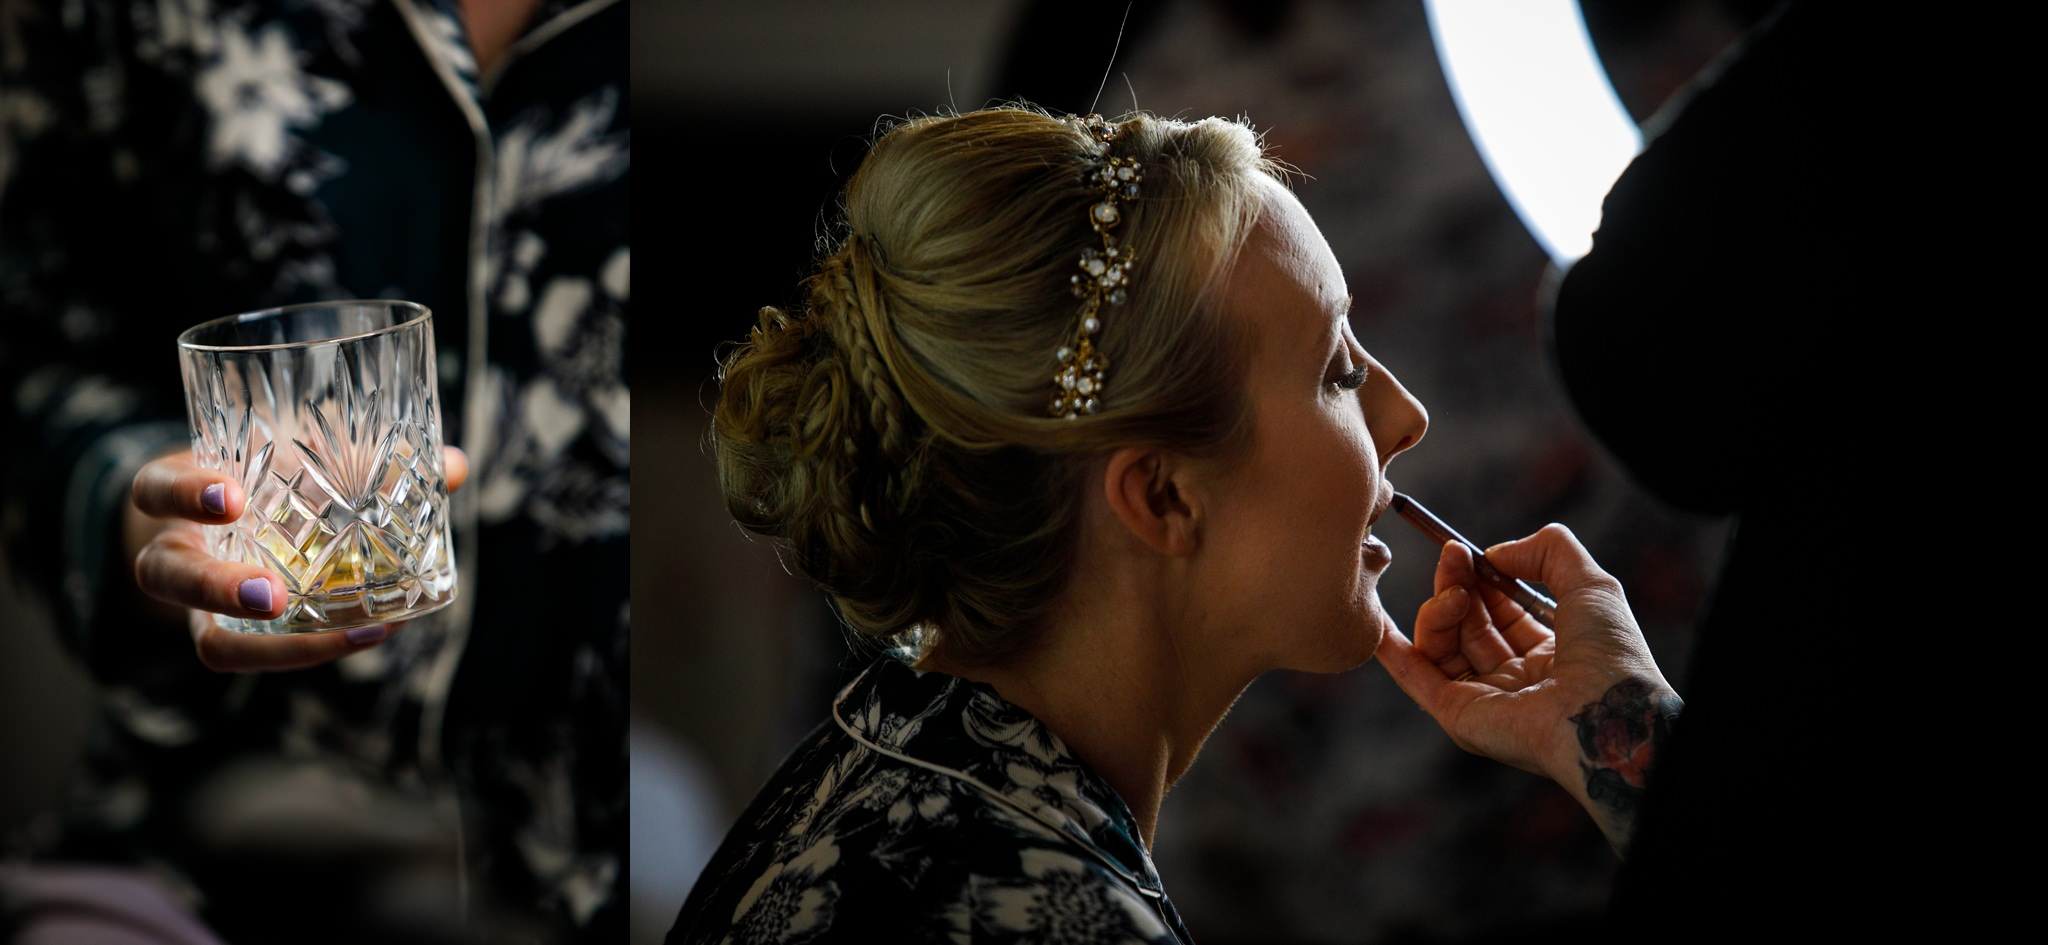 Elisha-Clarke-Photography-Dublin-City-Wedding_0037.jpg